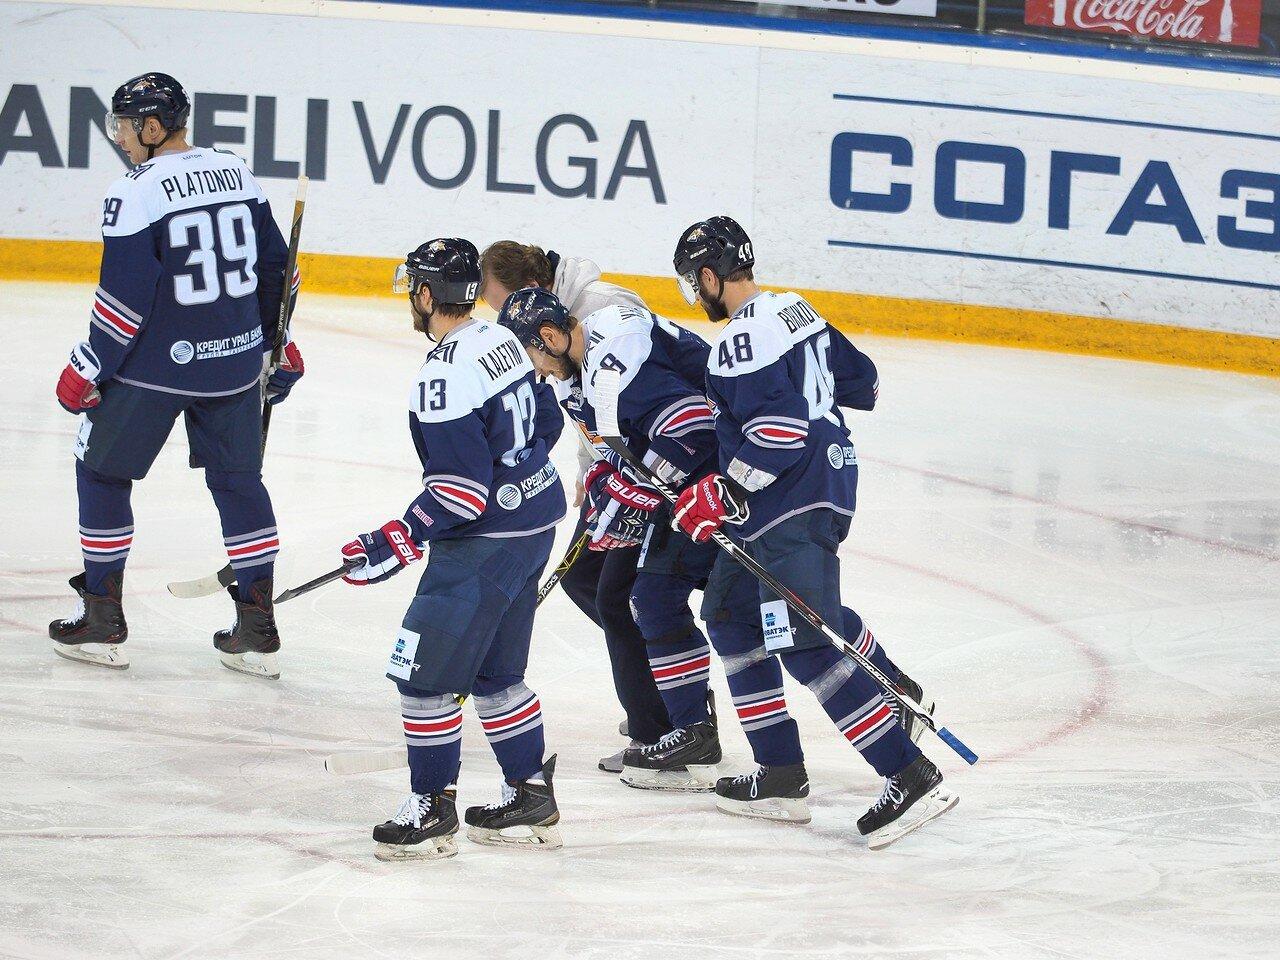 67Плей-офф 2016 Восток Финал Металлург - Салават Юлаев 23.03.2016